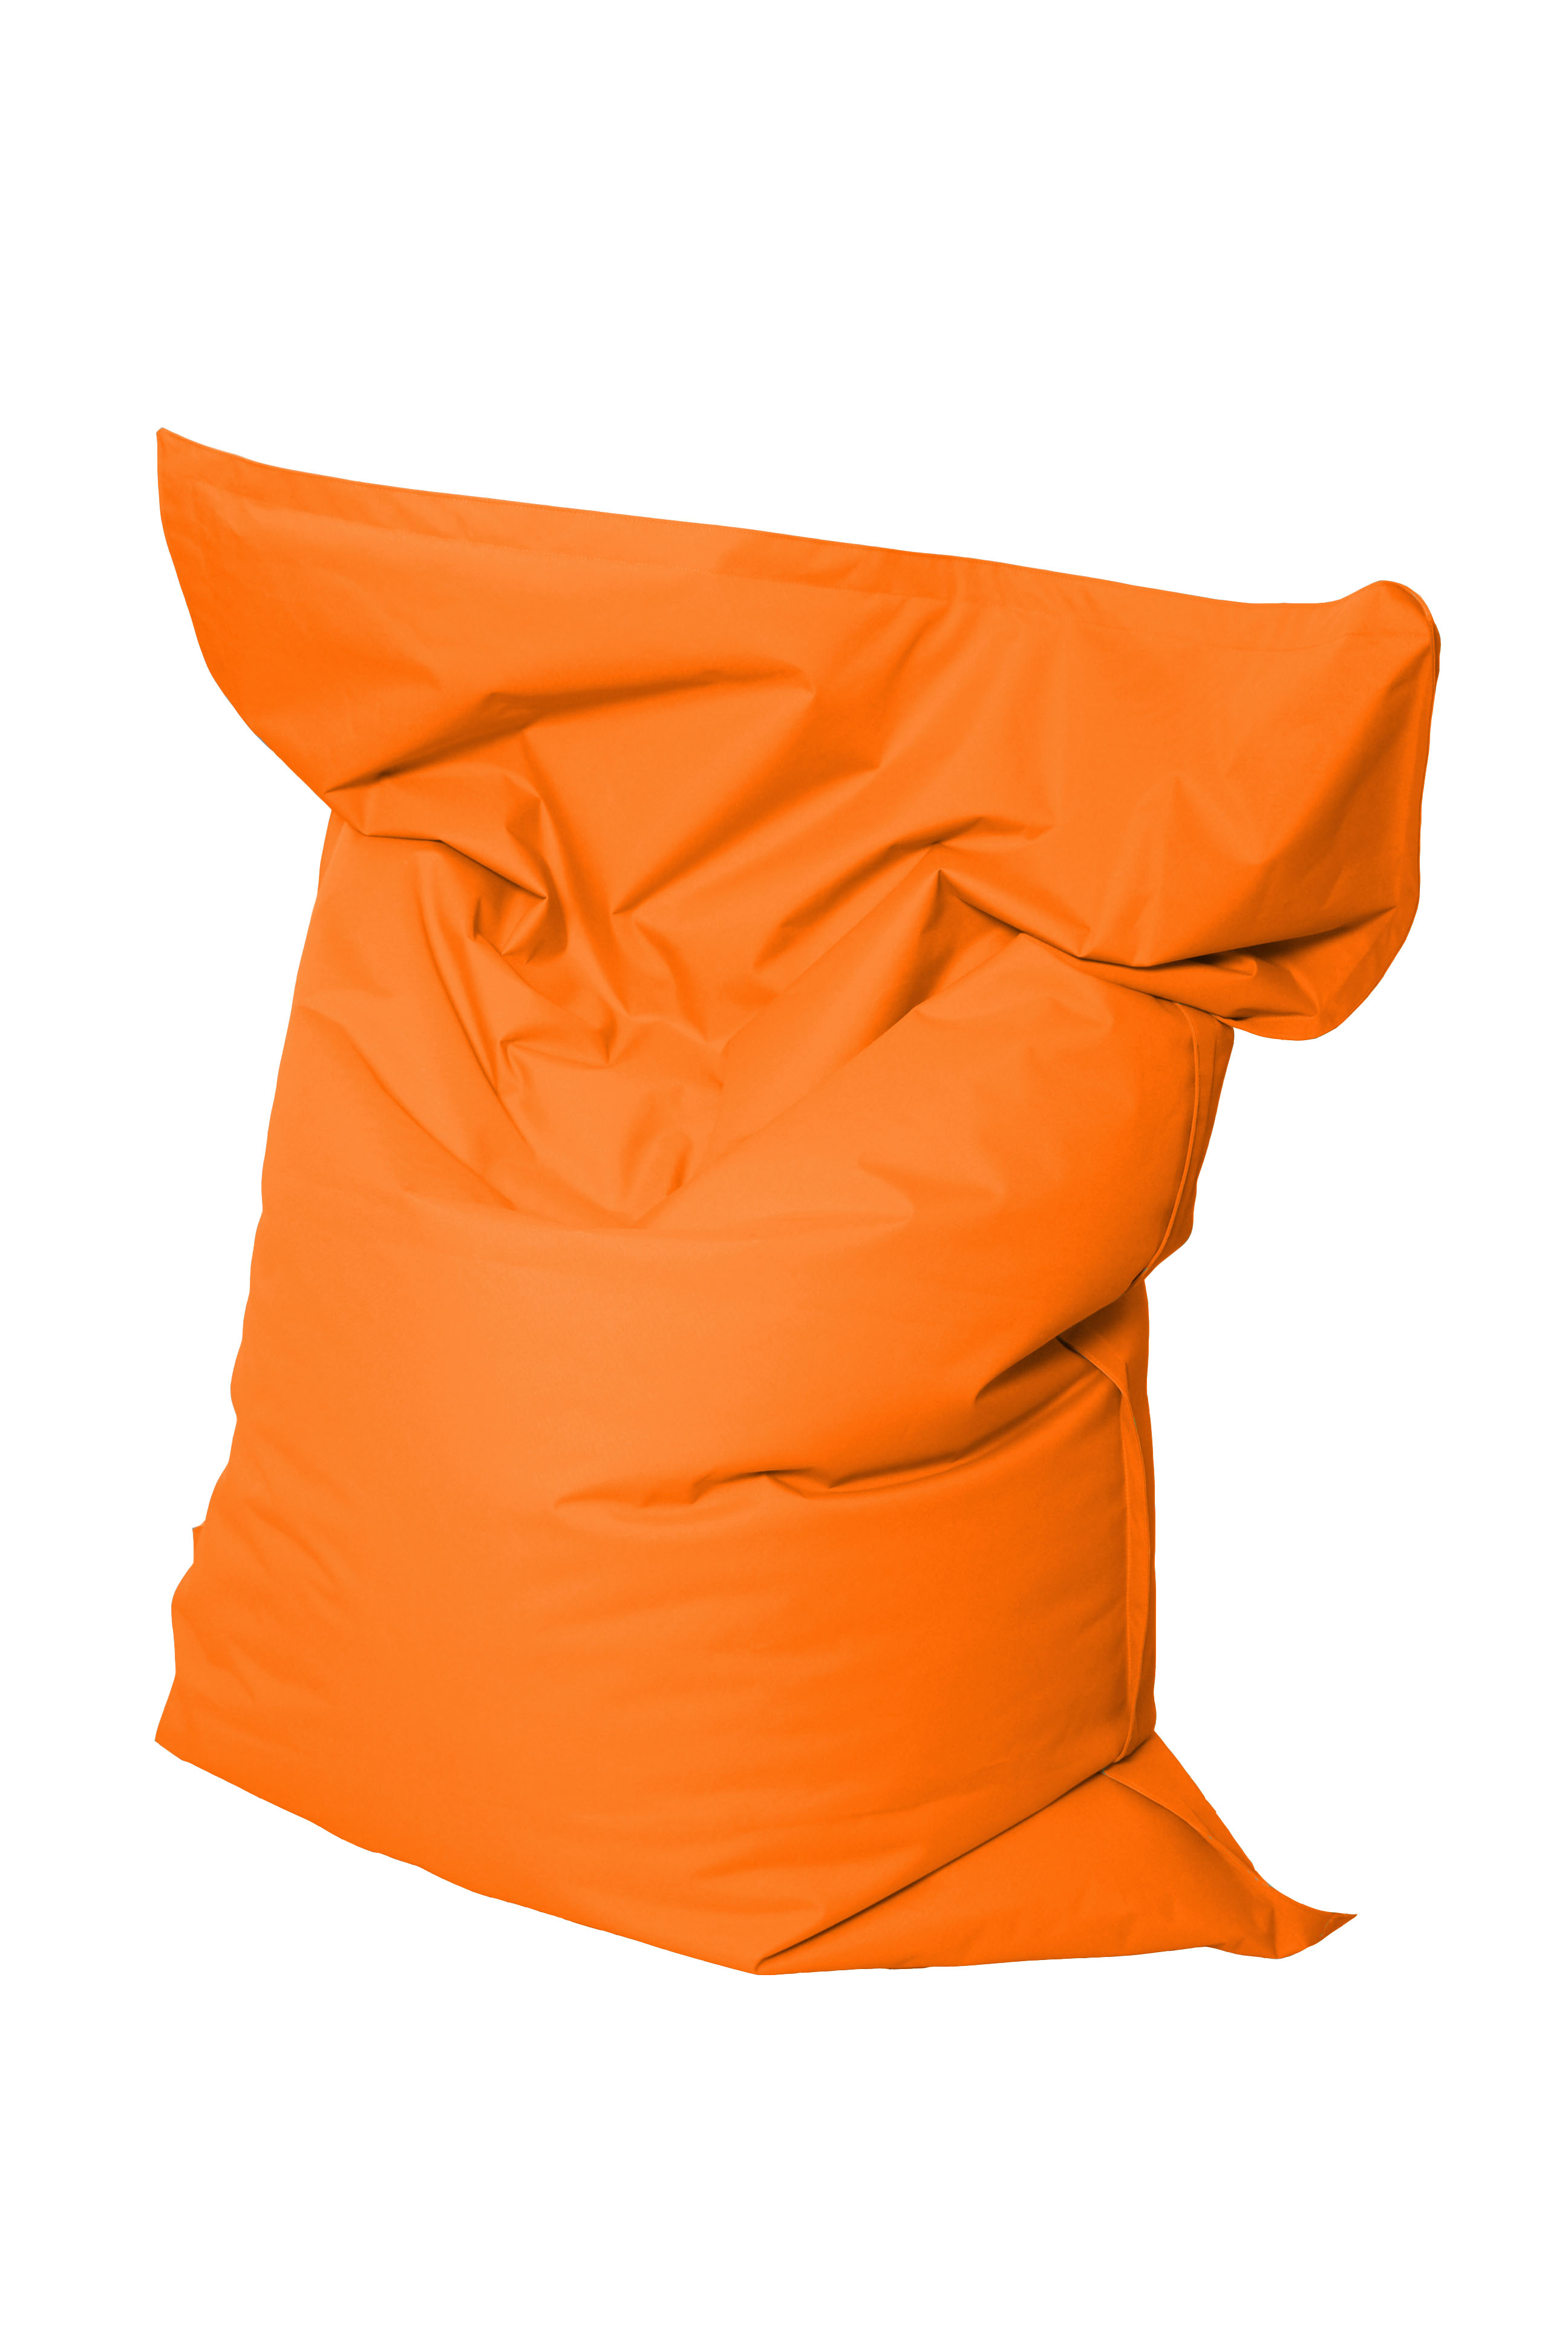 M&M sedací vak Maxi 200X140cm oranžová (oranžová 60012)